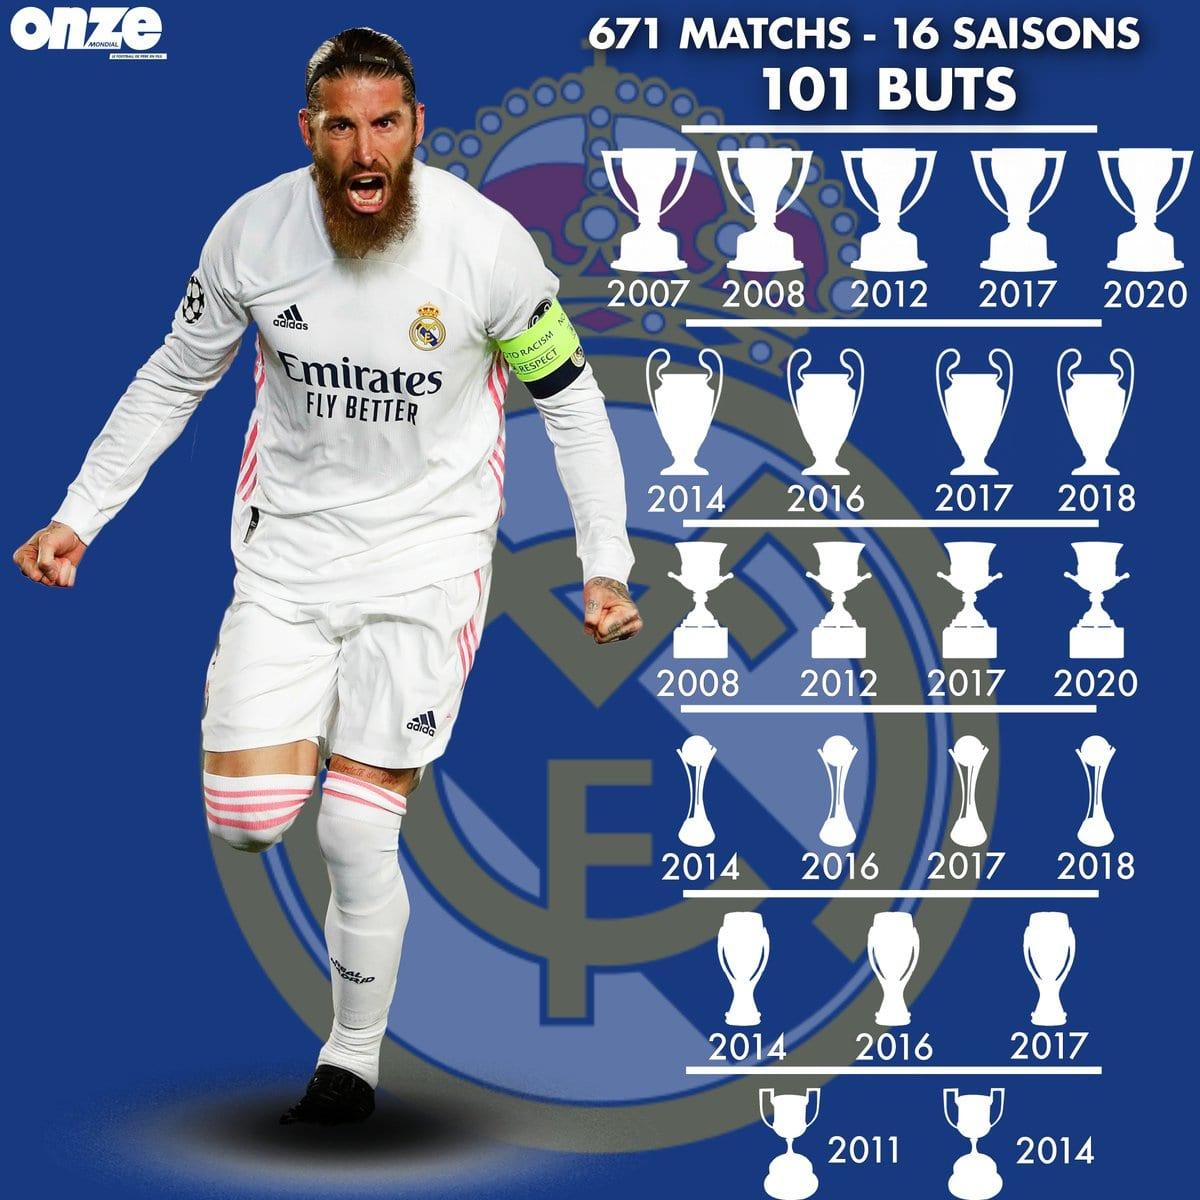 Real Madrid : Le Bilan Incroyable De Sergio Ramos Avec La Maison Blanche